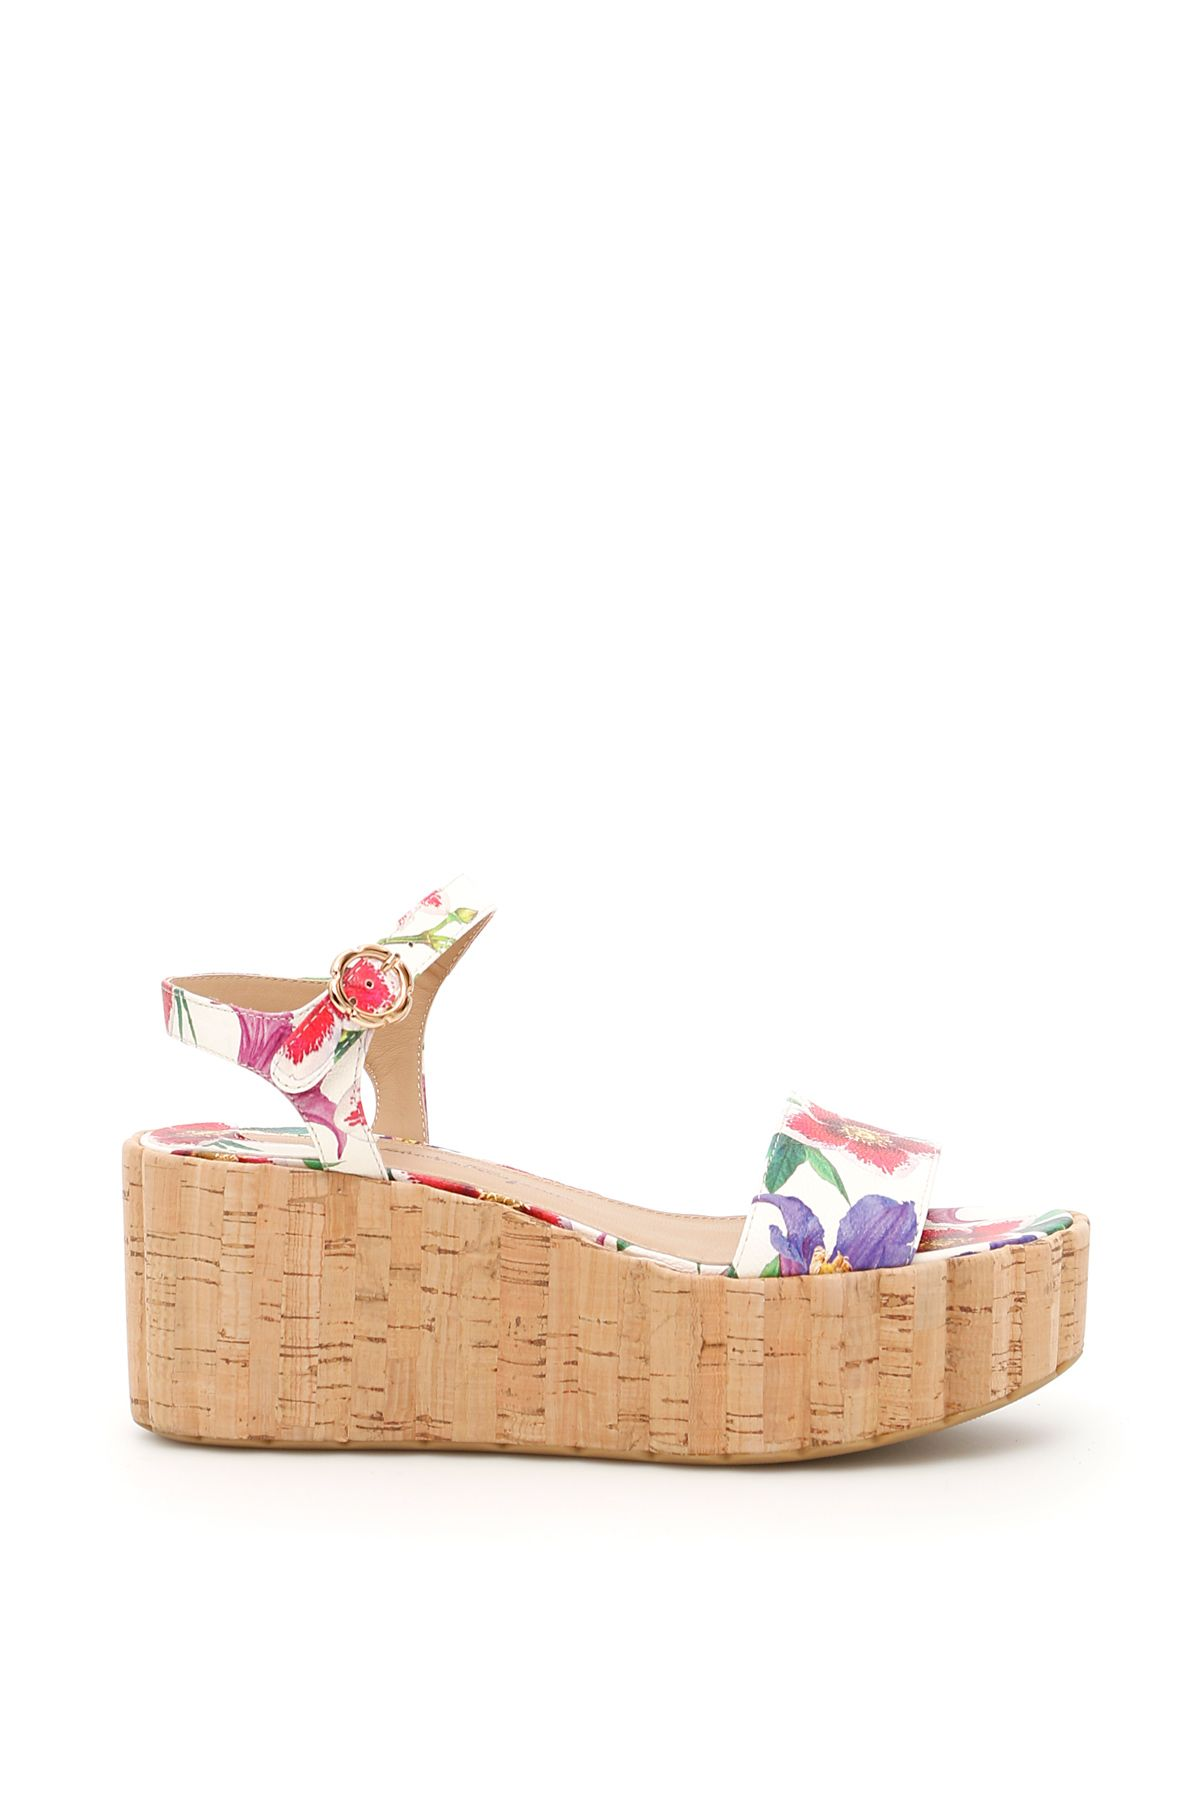 Cheap Limited Edition Salvatore Ferragamo Floral Print Tropea Sandals Discount Affordable Buy Cheap Best Place ugeeEcS0